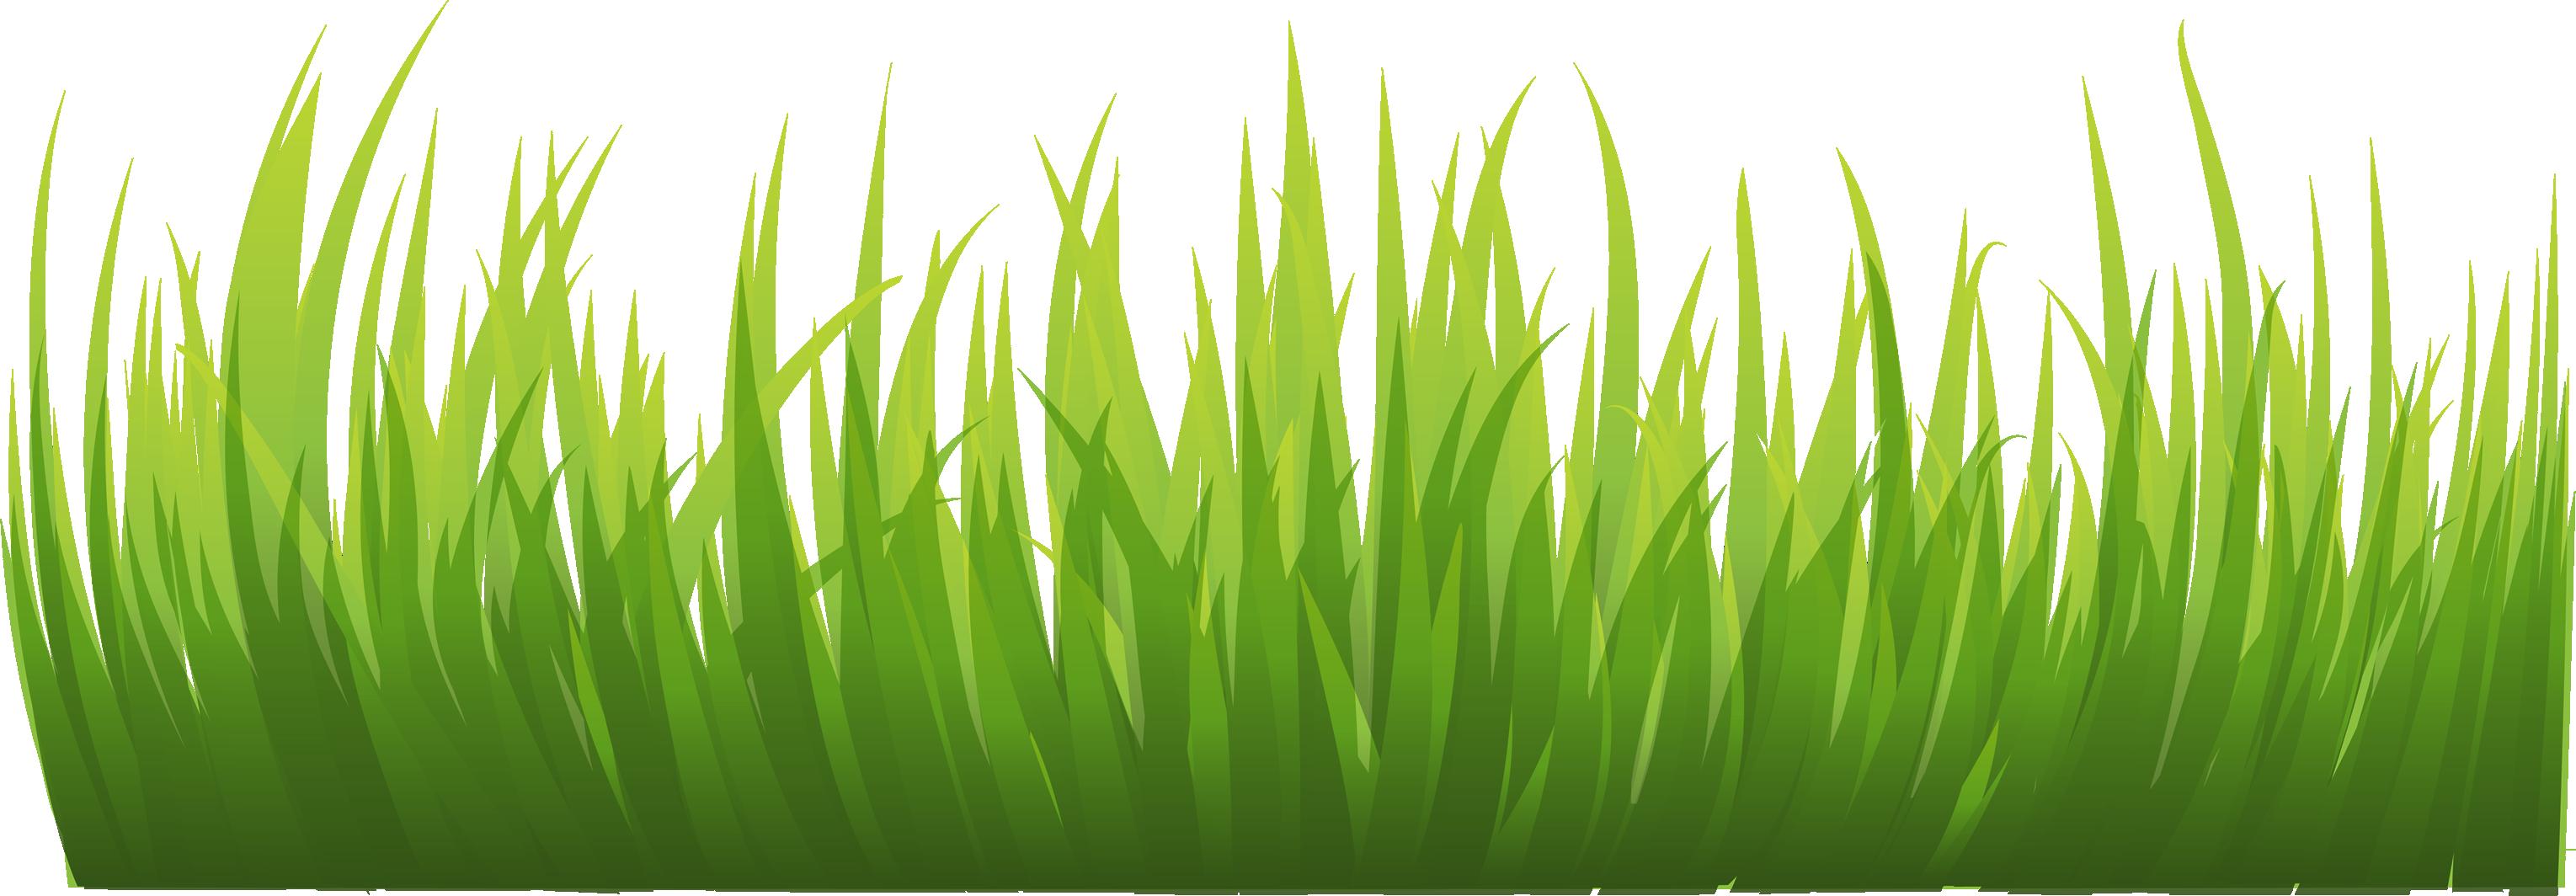 Pin by kushalagarwalkushal on. Clipart grass food